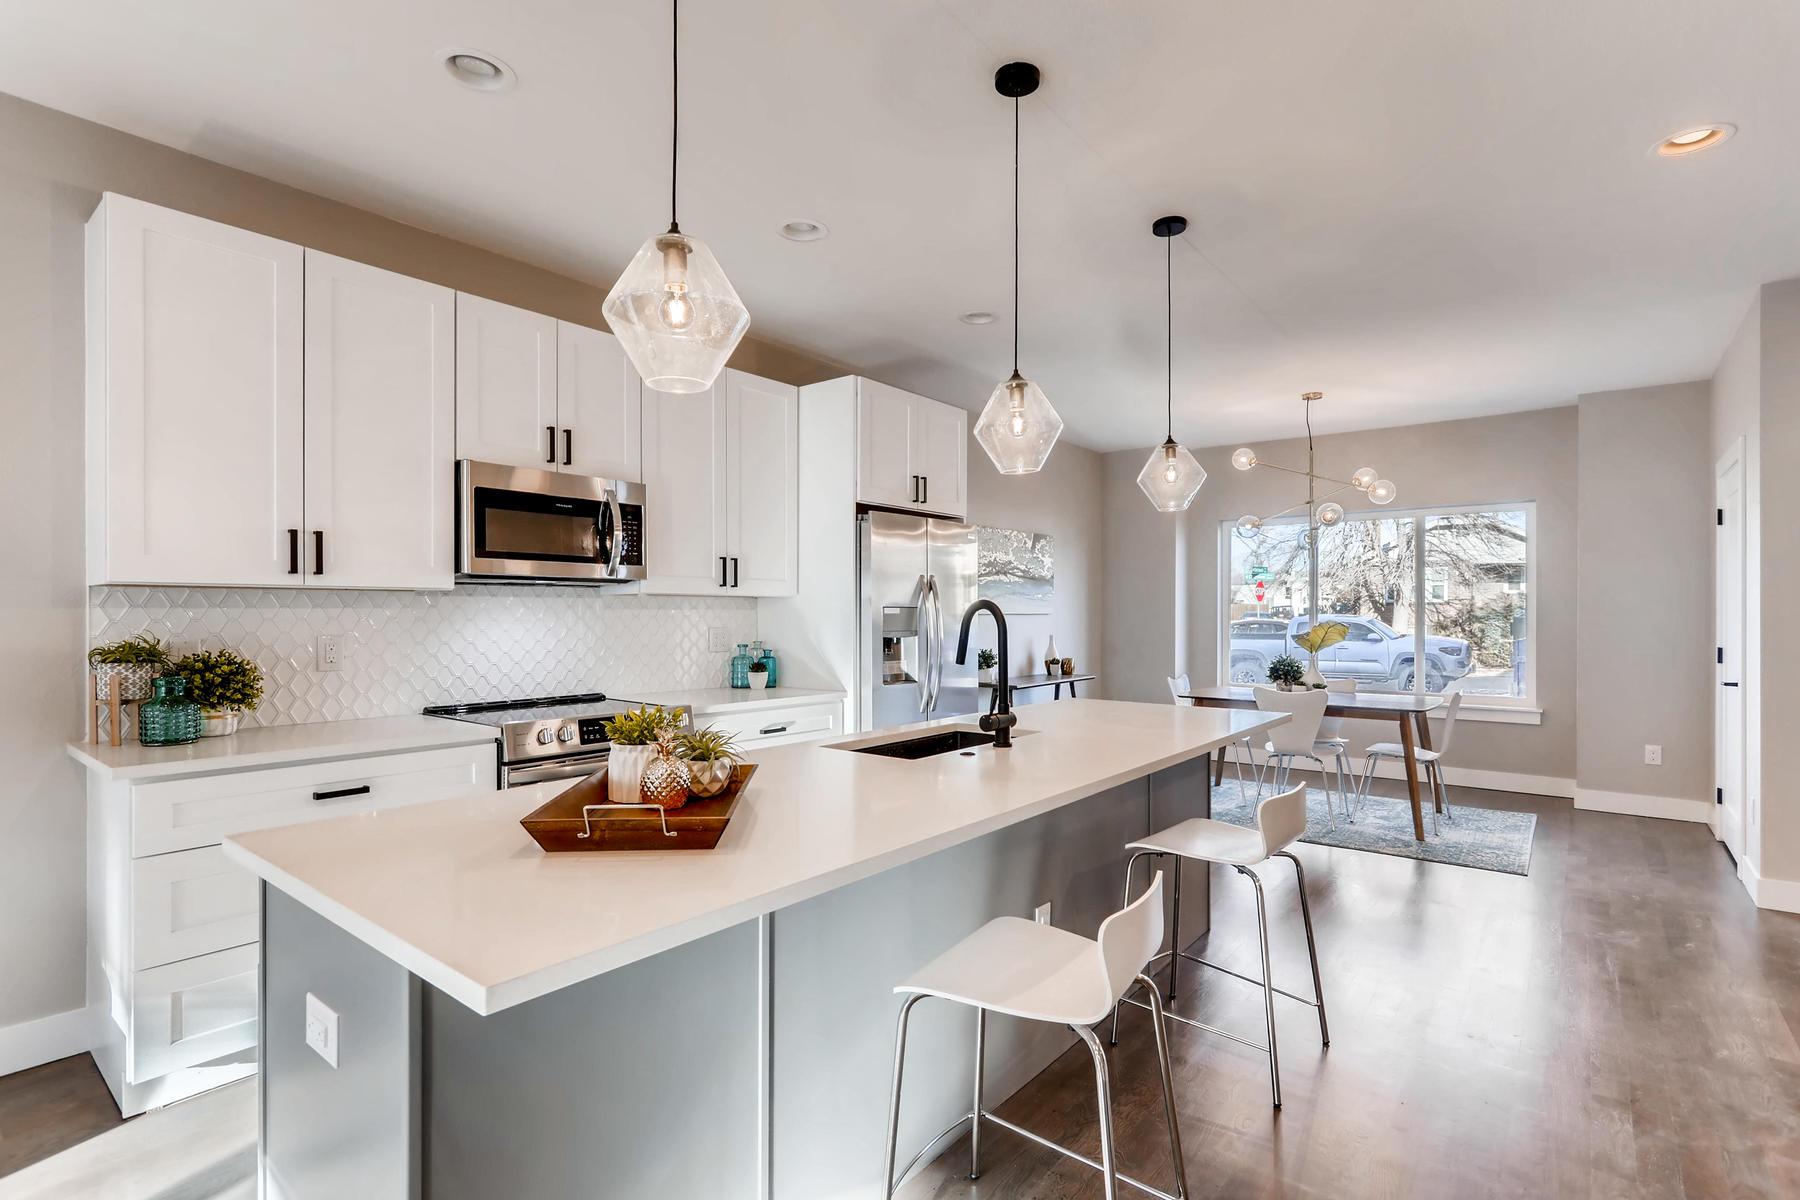 3105 S Cherokee St Englewood-013-11-Kitchen-MLS_Size.jpg